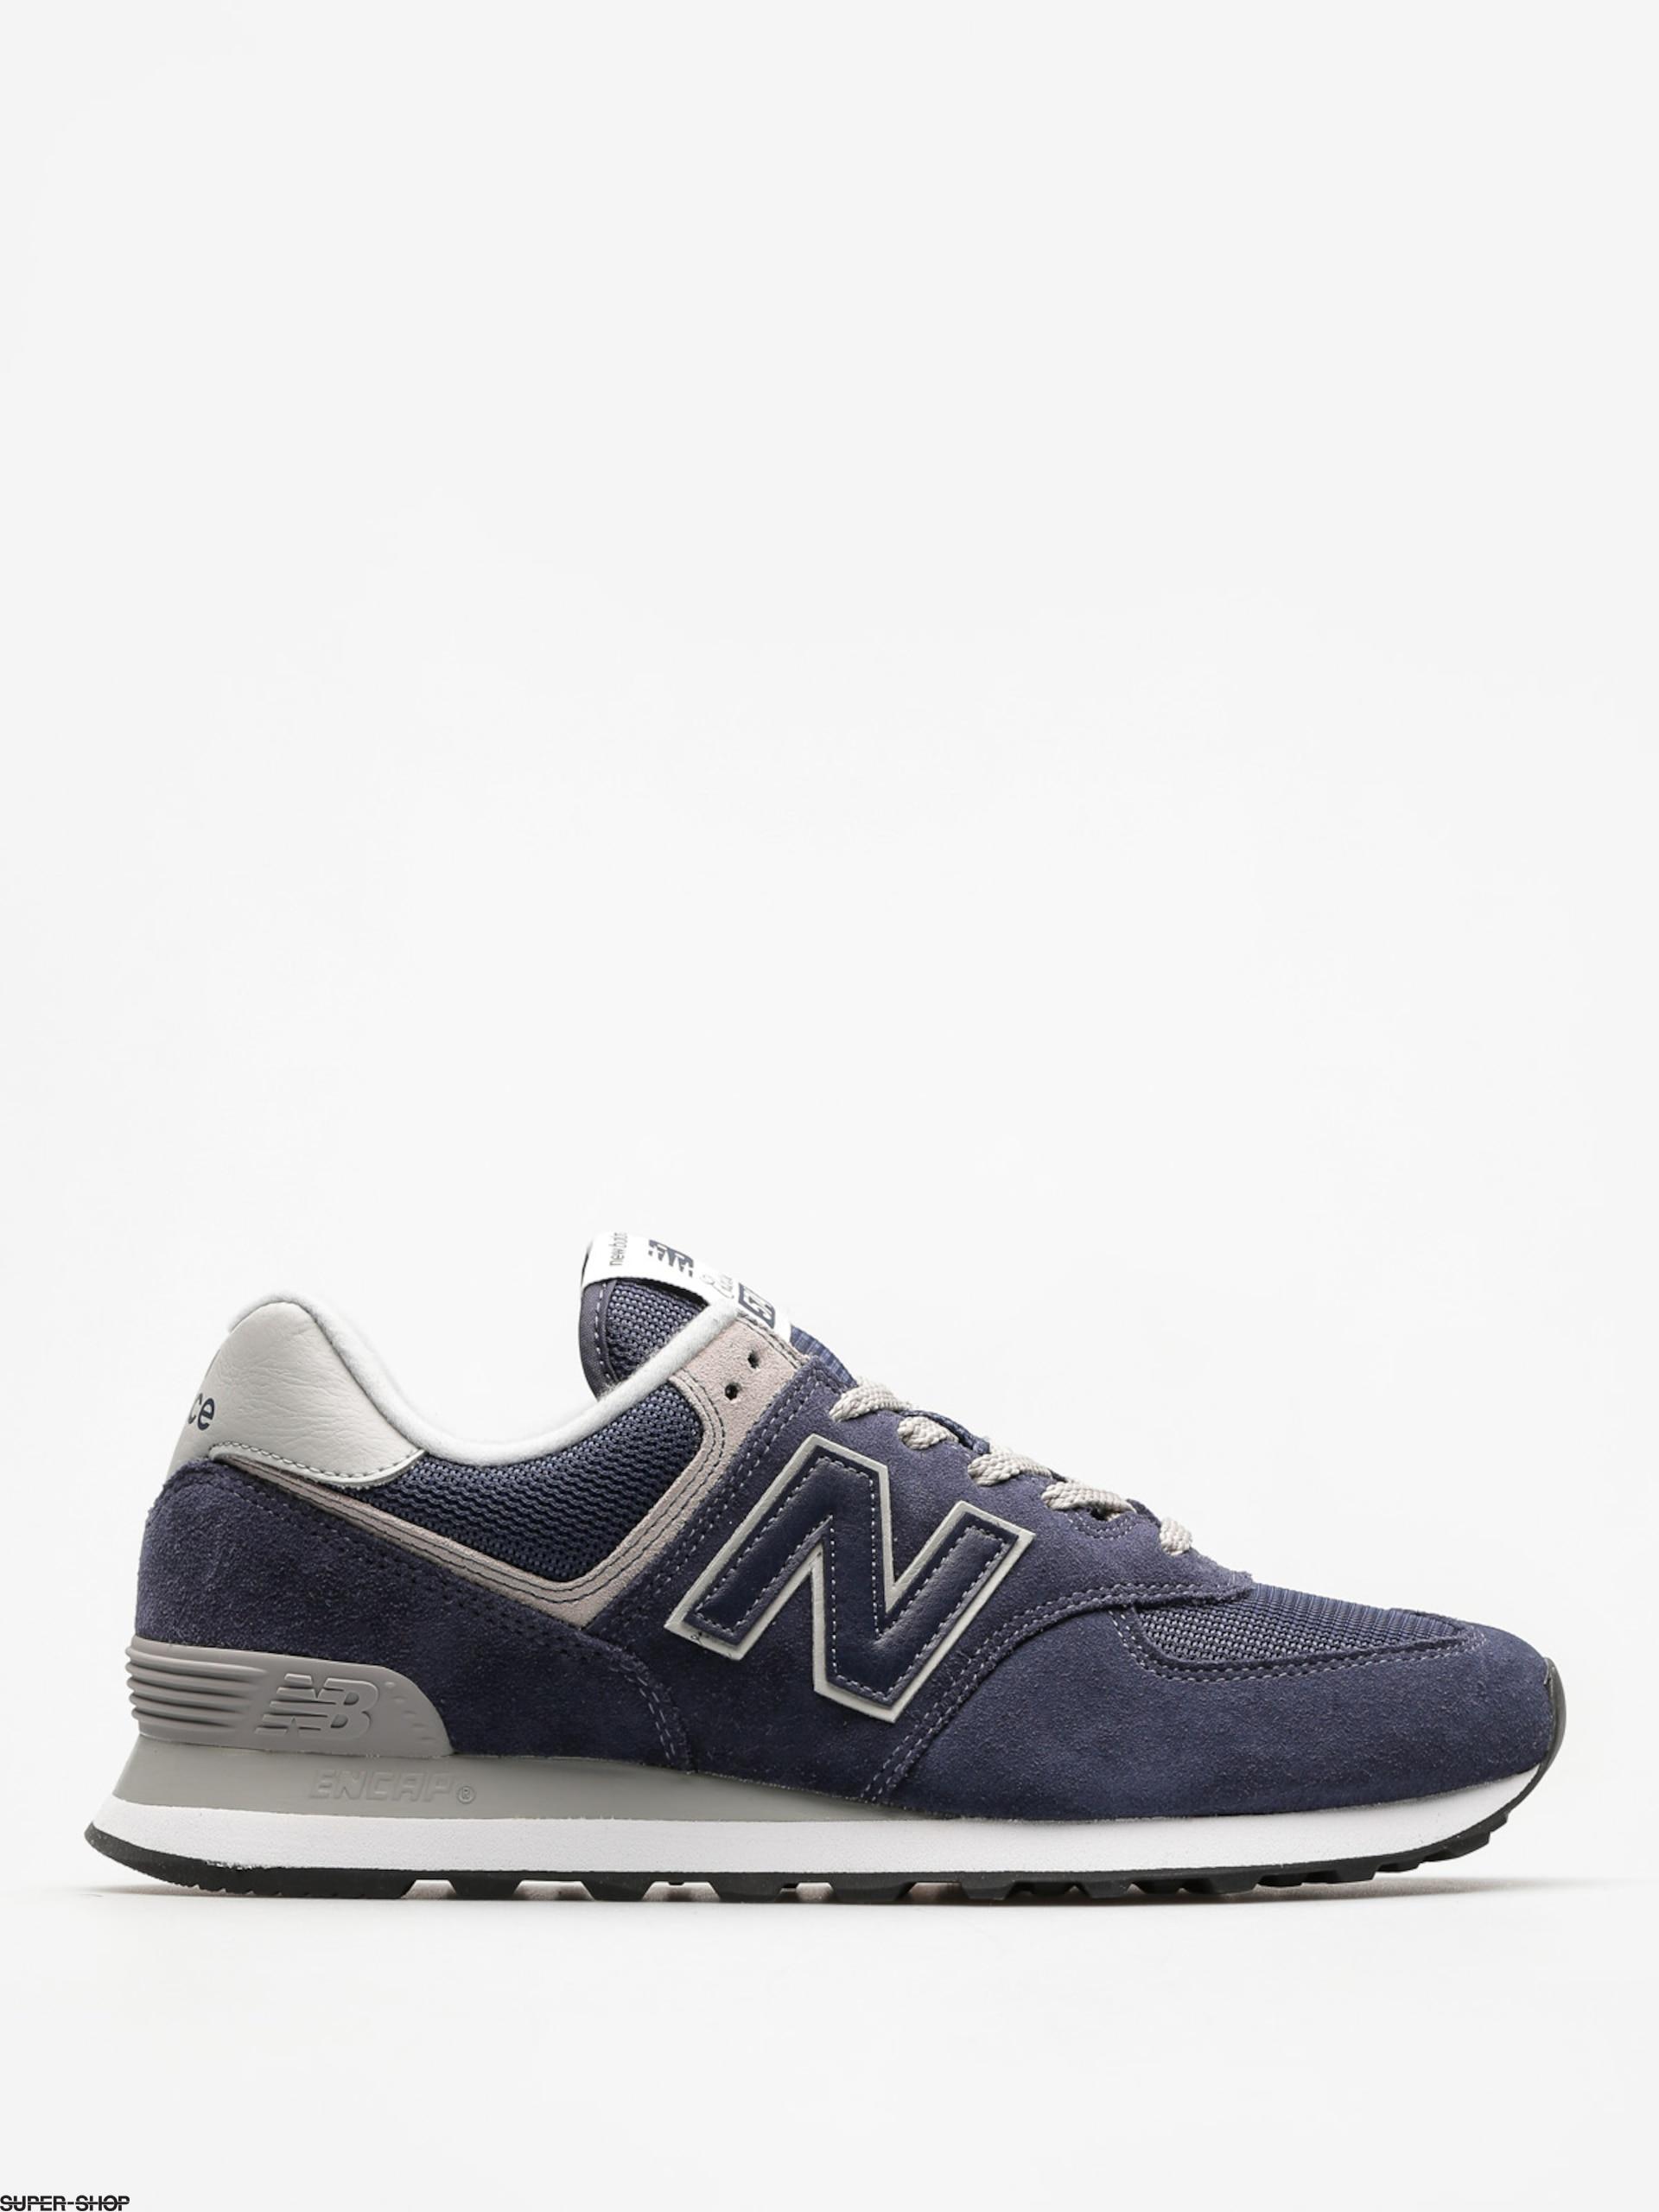 new style 9de2c 2cf13 New Balance Shoes 574 (black/iris)